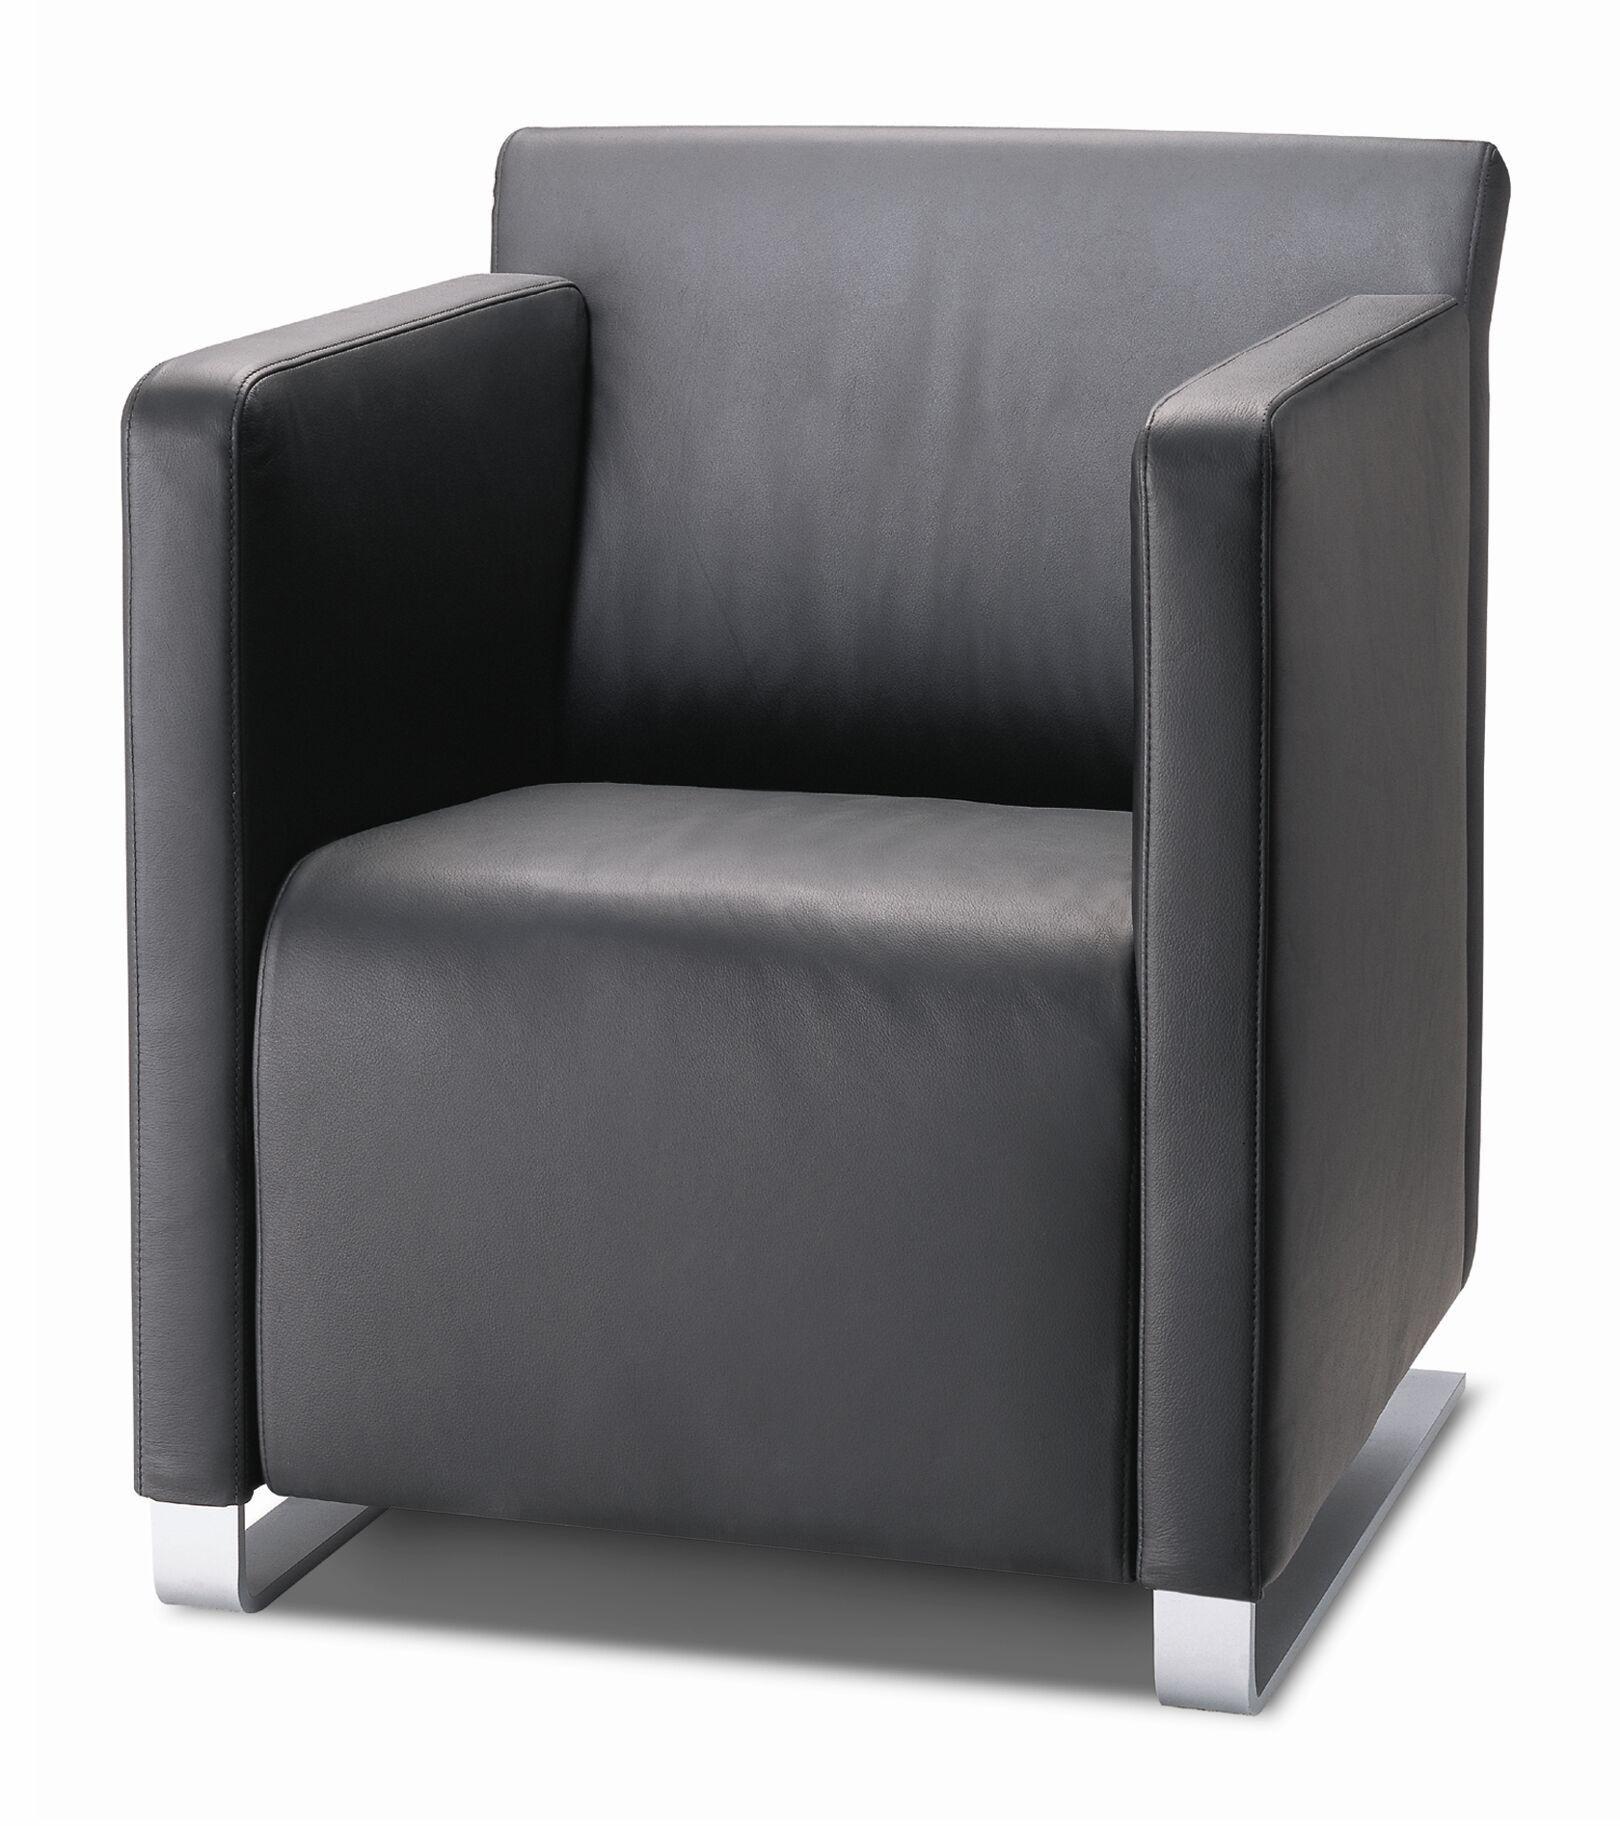 COR Sessel Quant | Der Sessel mit prägnant geschwungener ...